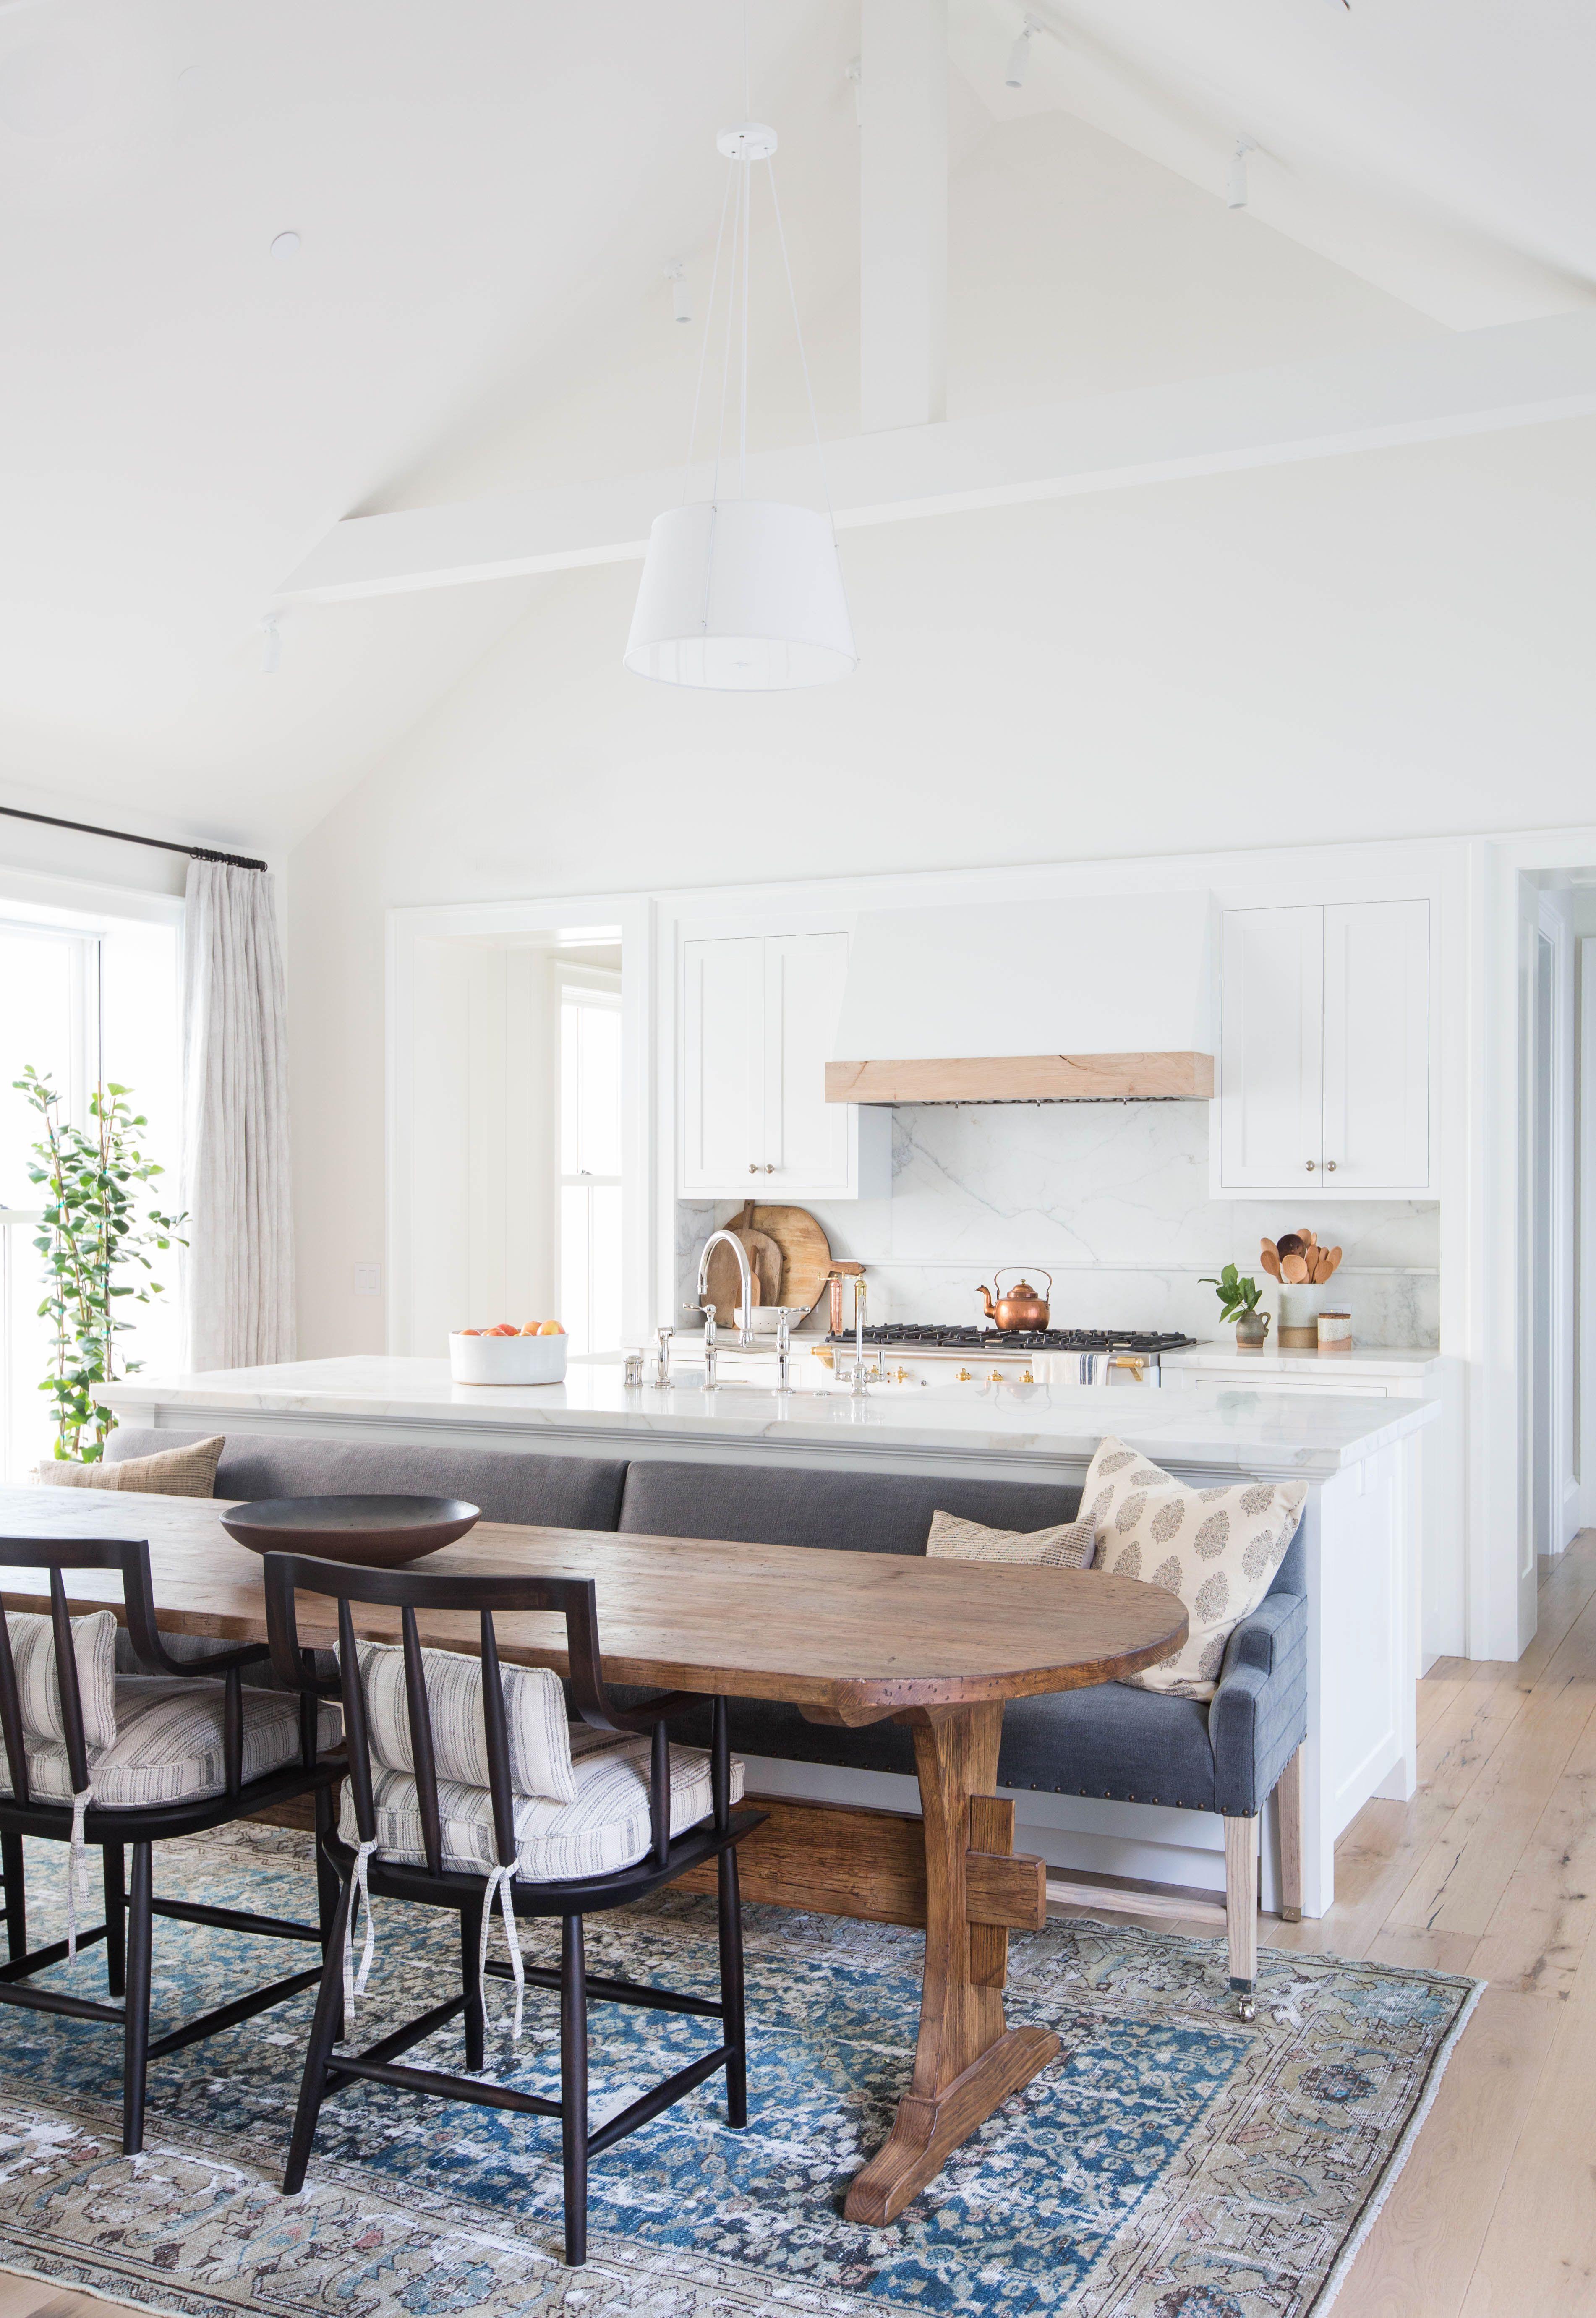 image & 15 Best Kitchen Island Ideas - Stylish \u0026 Unique Kitchen Island ...